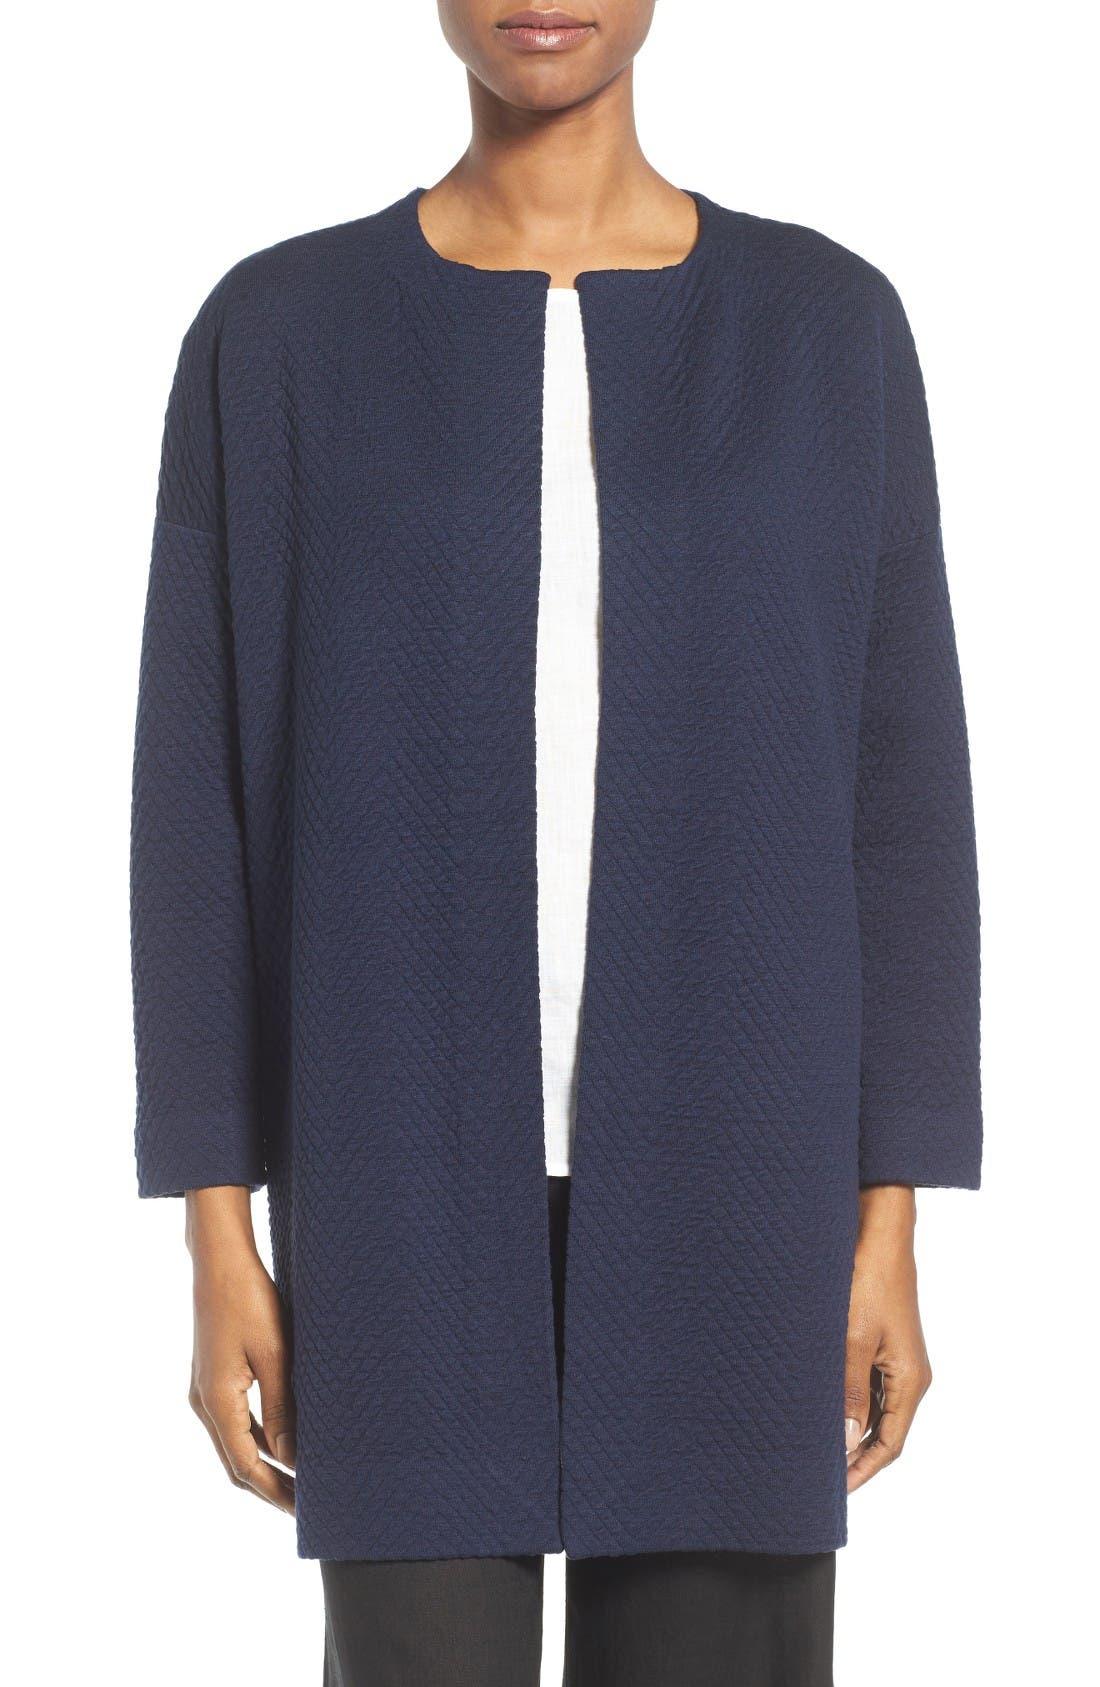 Alternate Image 1 Selected - Eileen Fisher Silk Blend Jacquard Jacket (Regular & Petite)